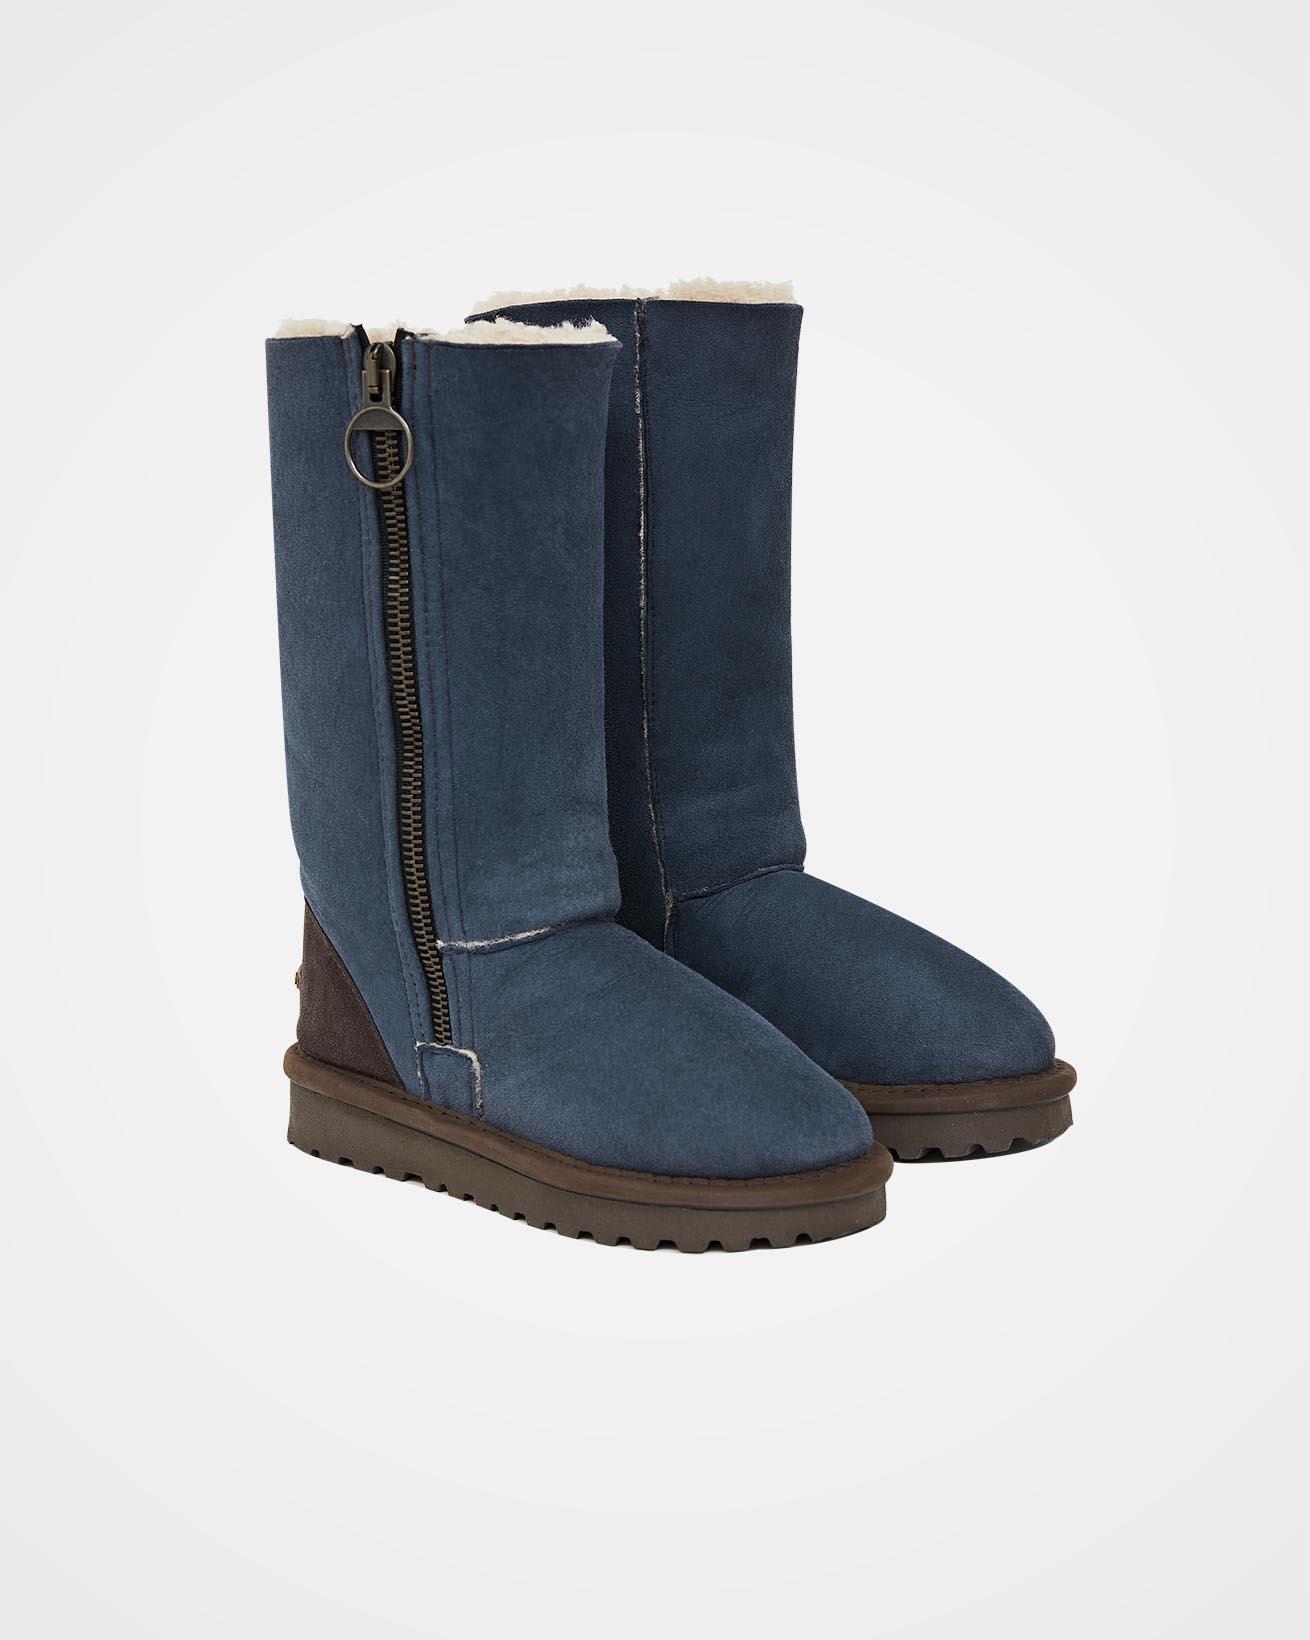 6846_aviator-calf-boots_blue-iris_pair_web_v2.jpg